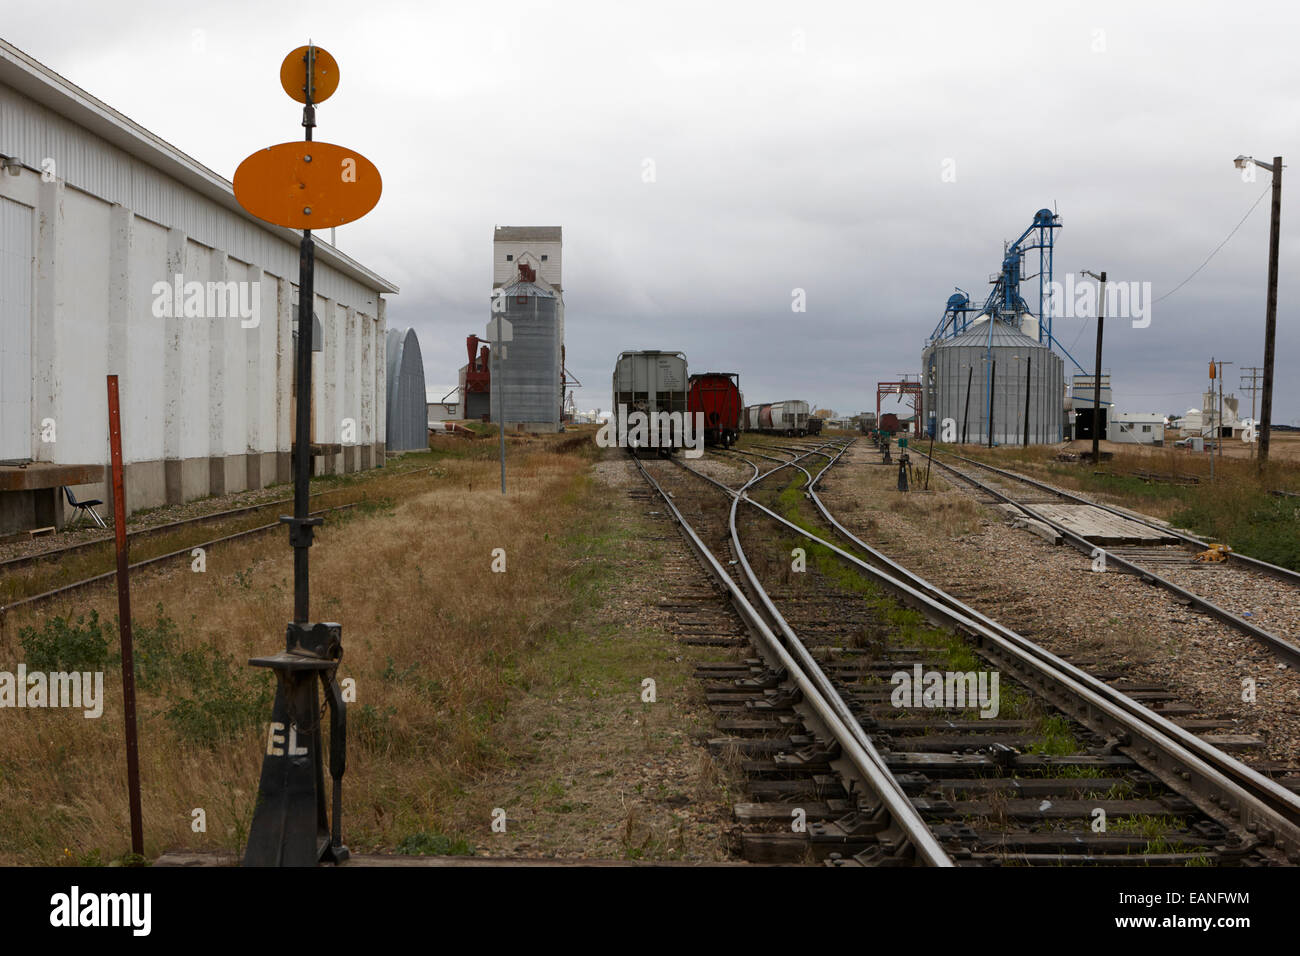 Línea de ferrocarril acercándose patio ferroviario de carga de granos assiniboia Saskatchewan Canadá Imagen De Stock